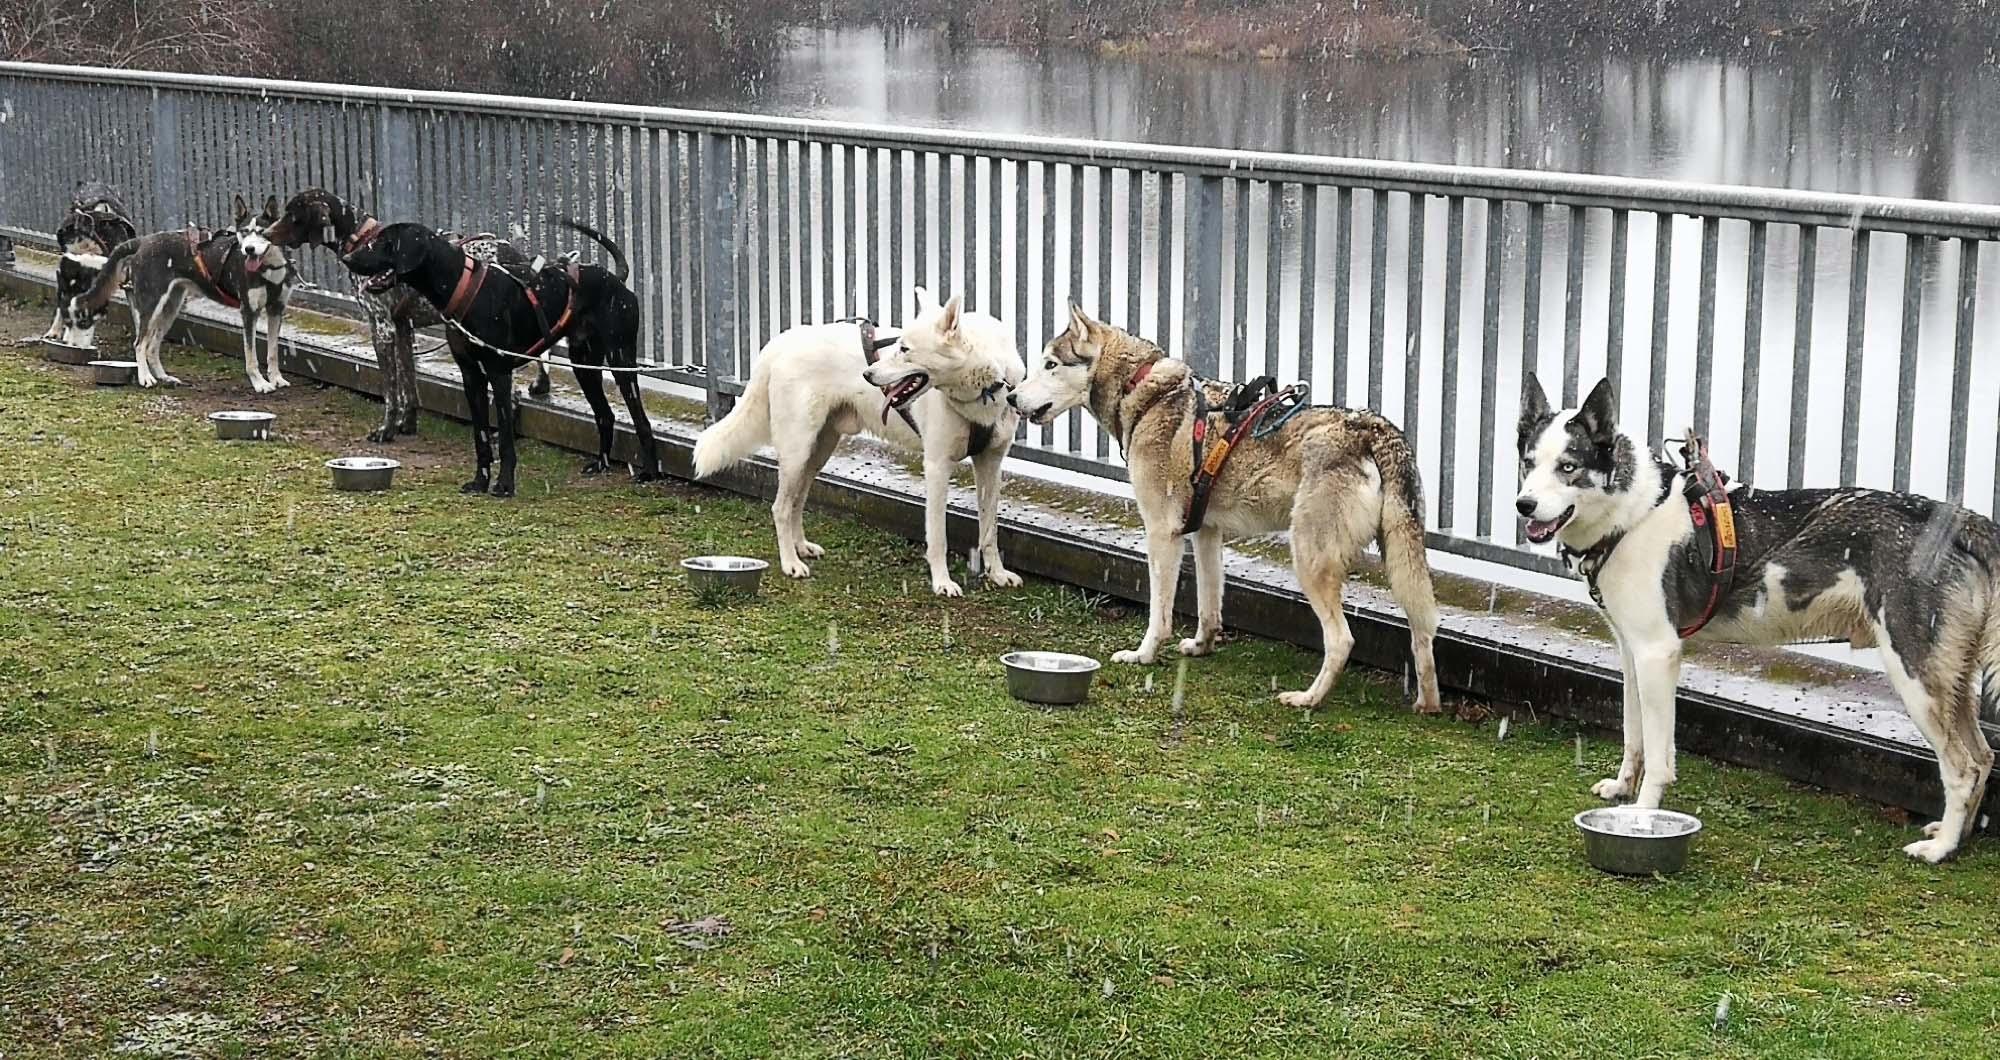 2021-1-29-Kinzigtal-Hansjörg Wörner-Hundeschlitten-IMG_20201231_104501